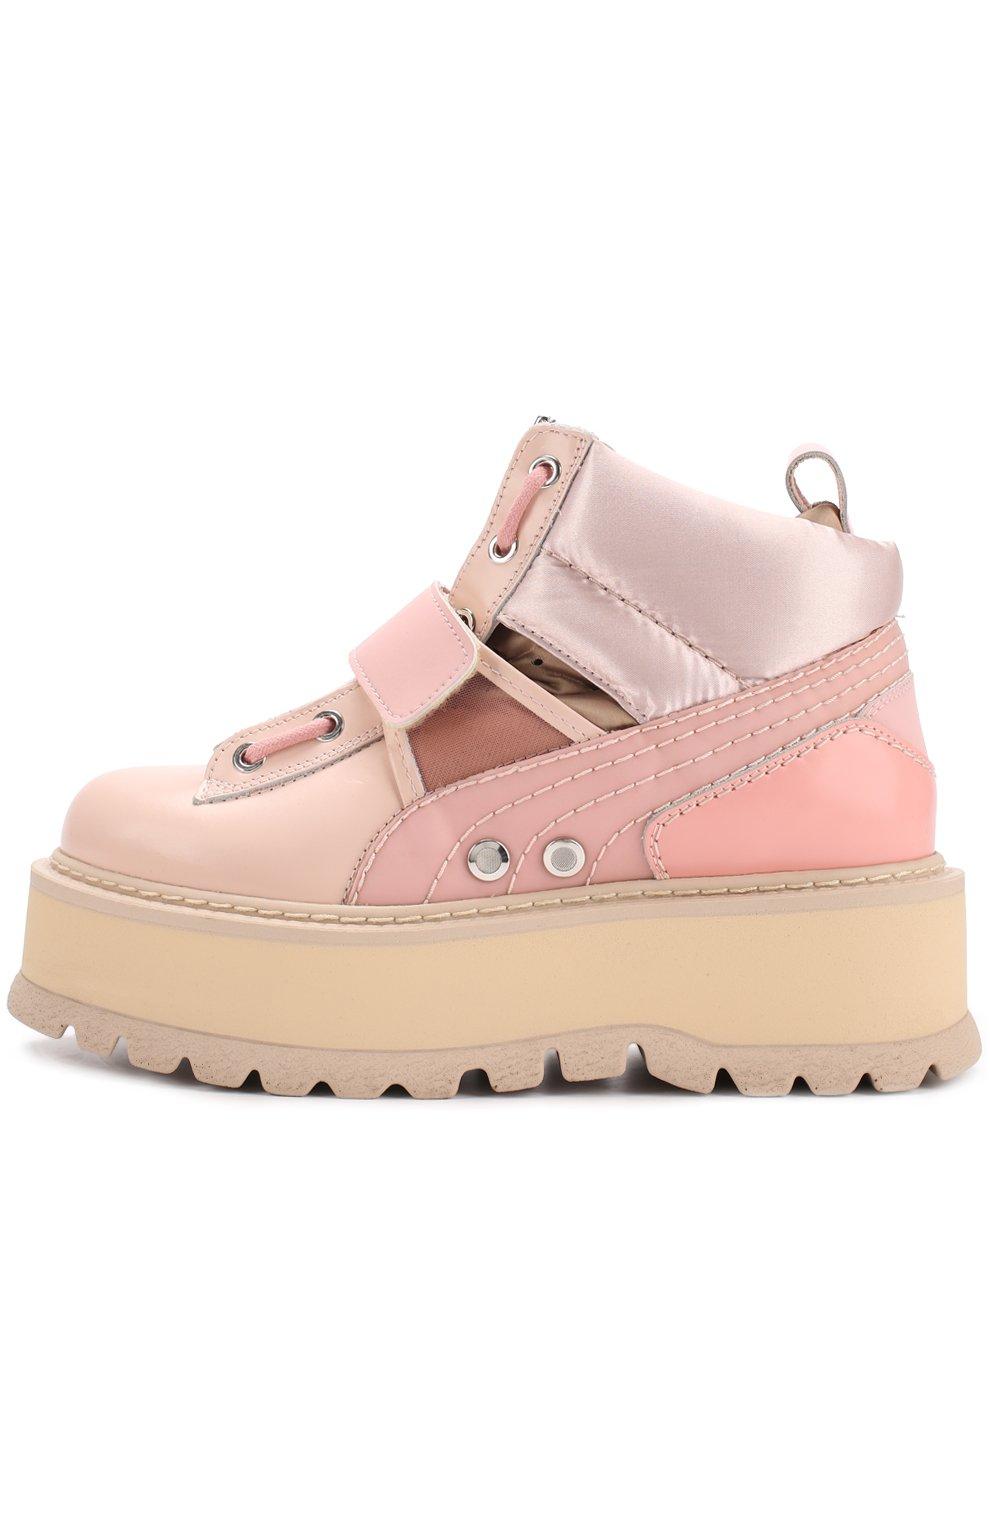 Женские розовые ботинки на платформе fenty x puma by rihanna FENTY ... 95fe705b5ff